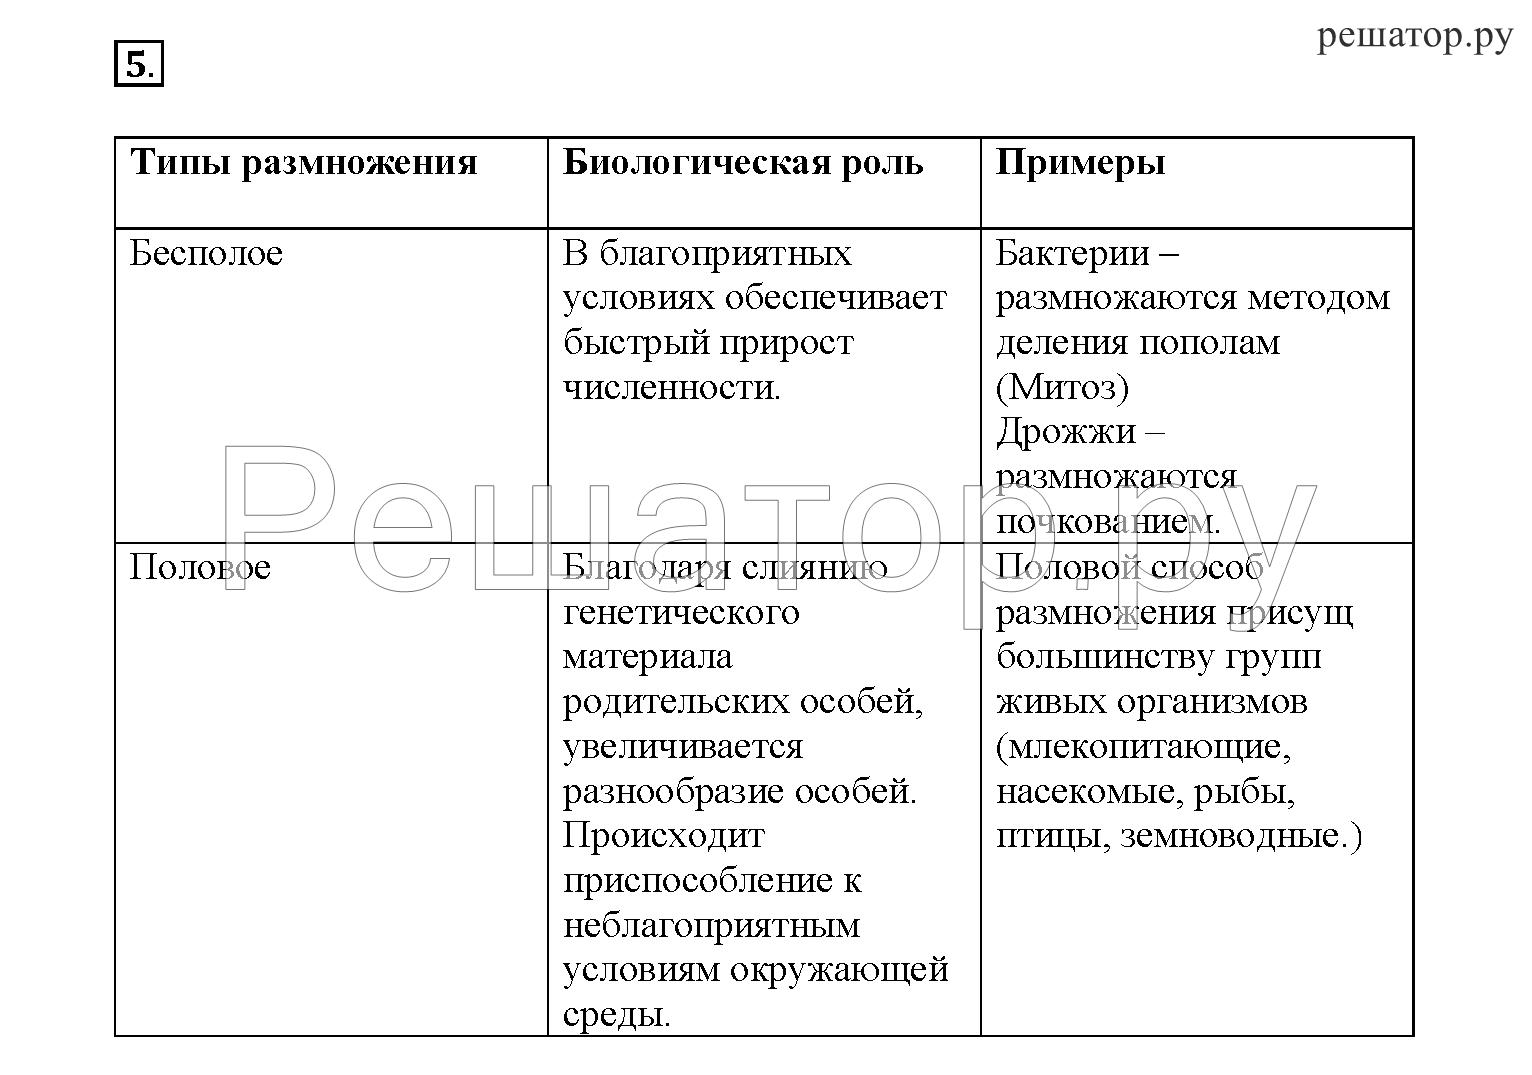 Рост организма и развитие организма. закономерности роста и развития организма человека